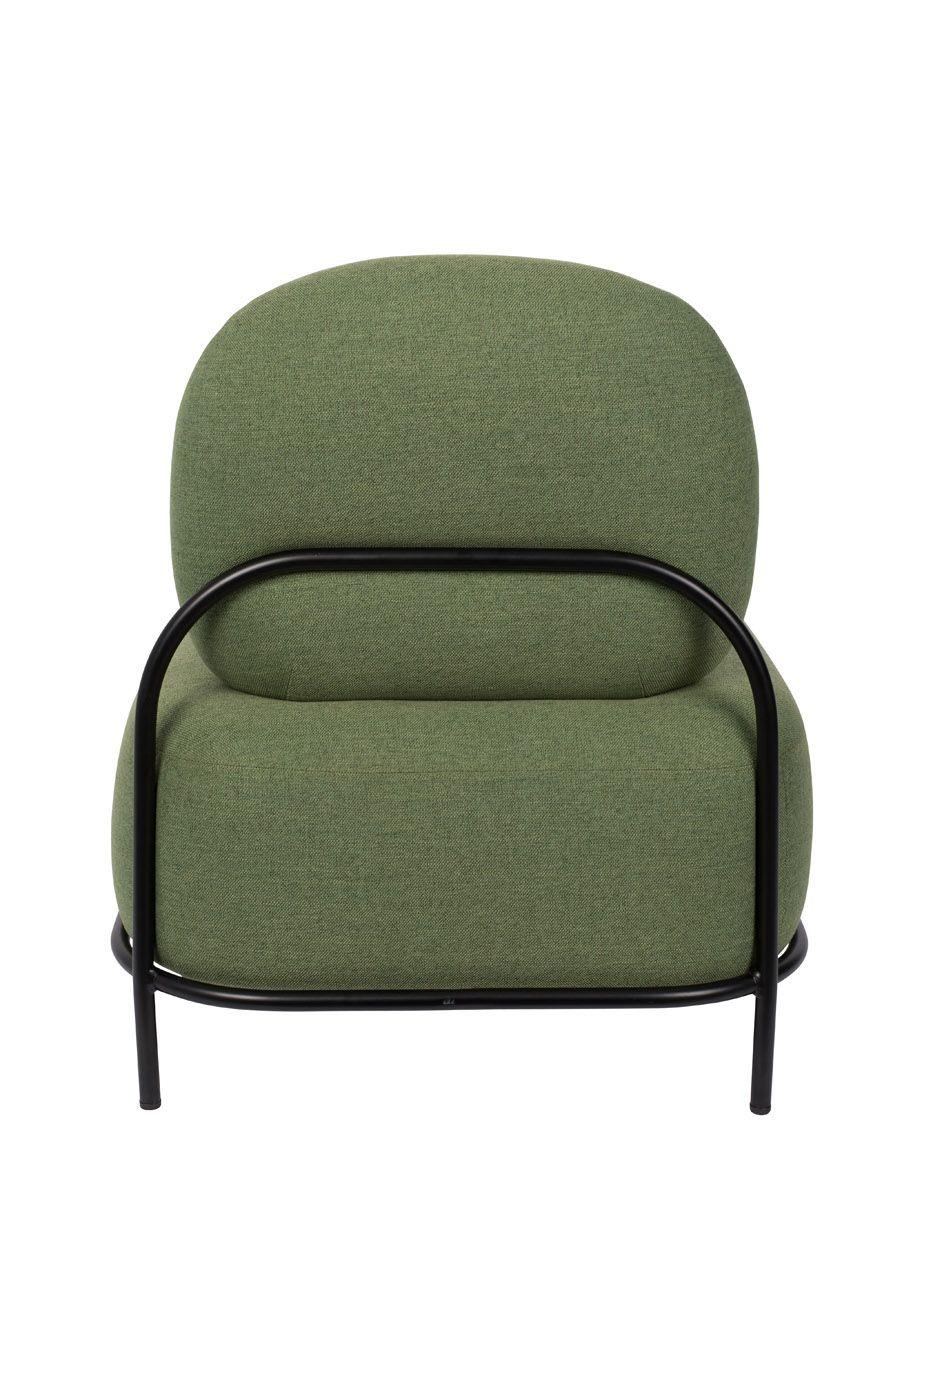 homii Polly Loungestol - Grøn